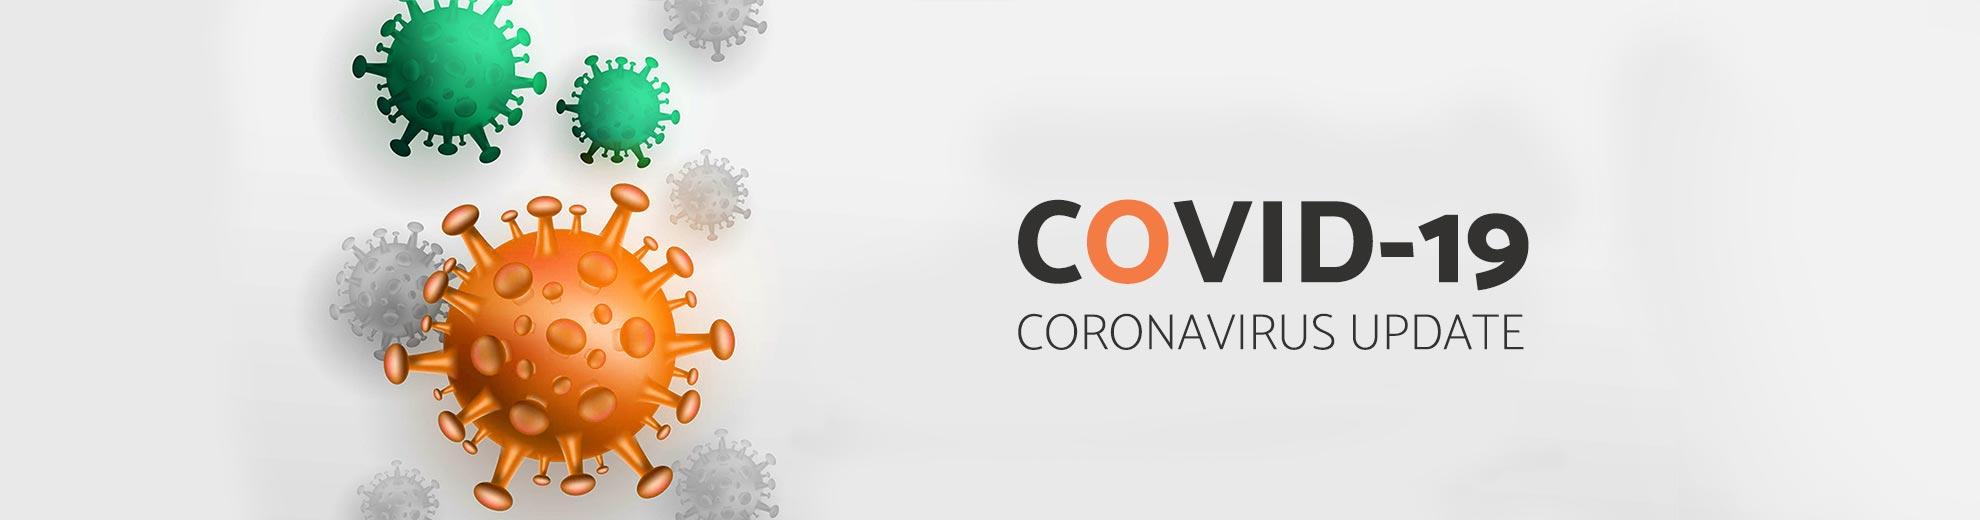 COVID-19 Update - remote language services